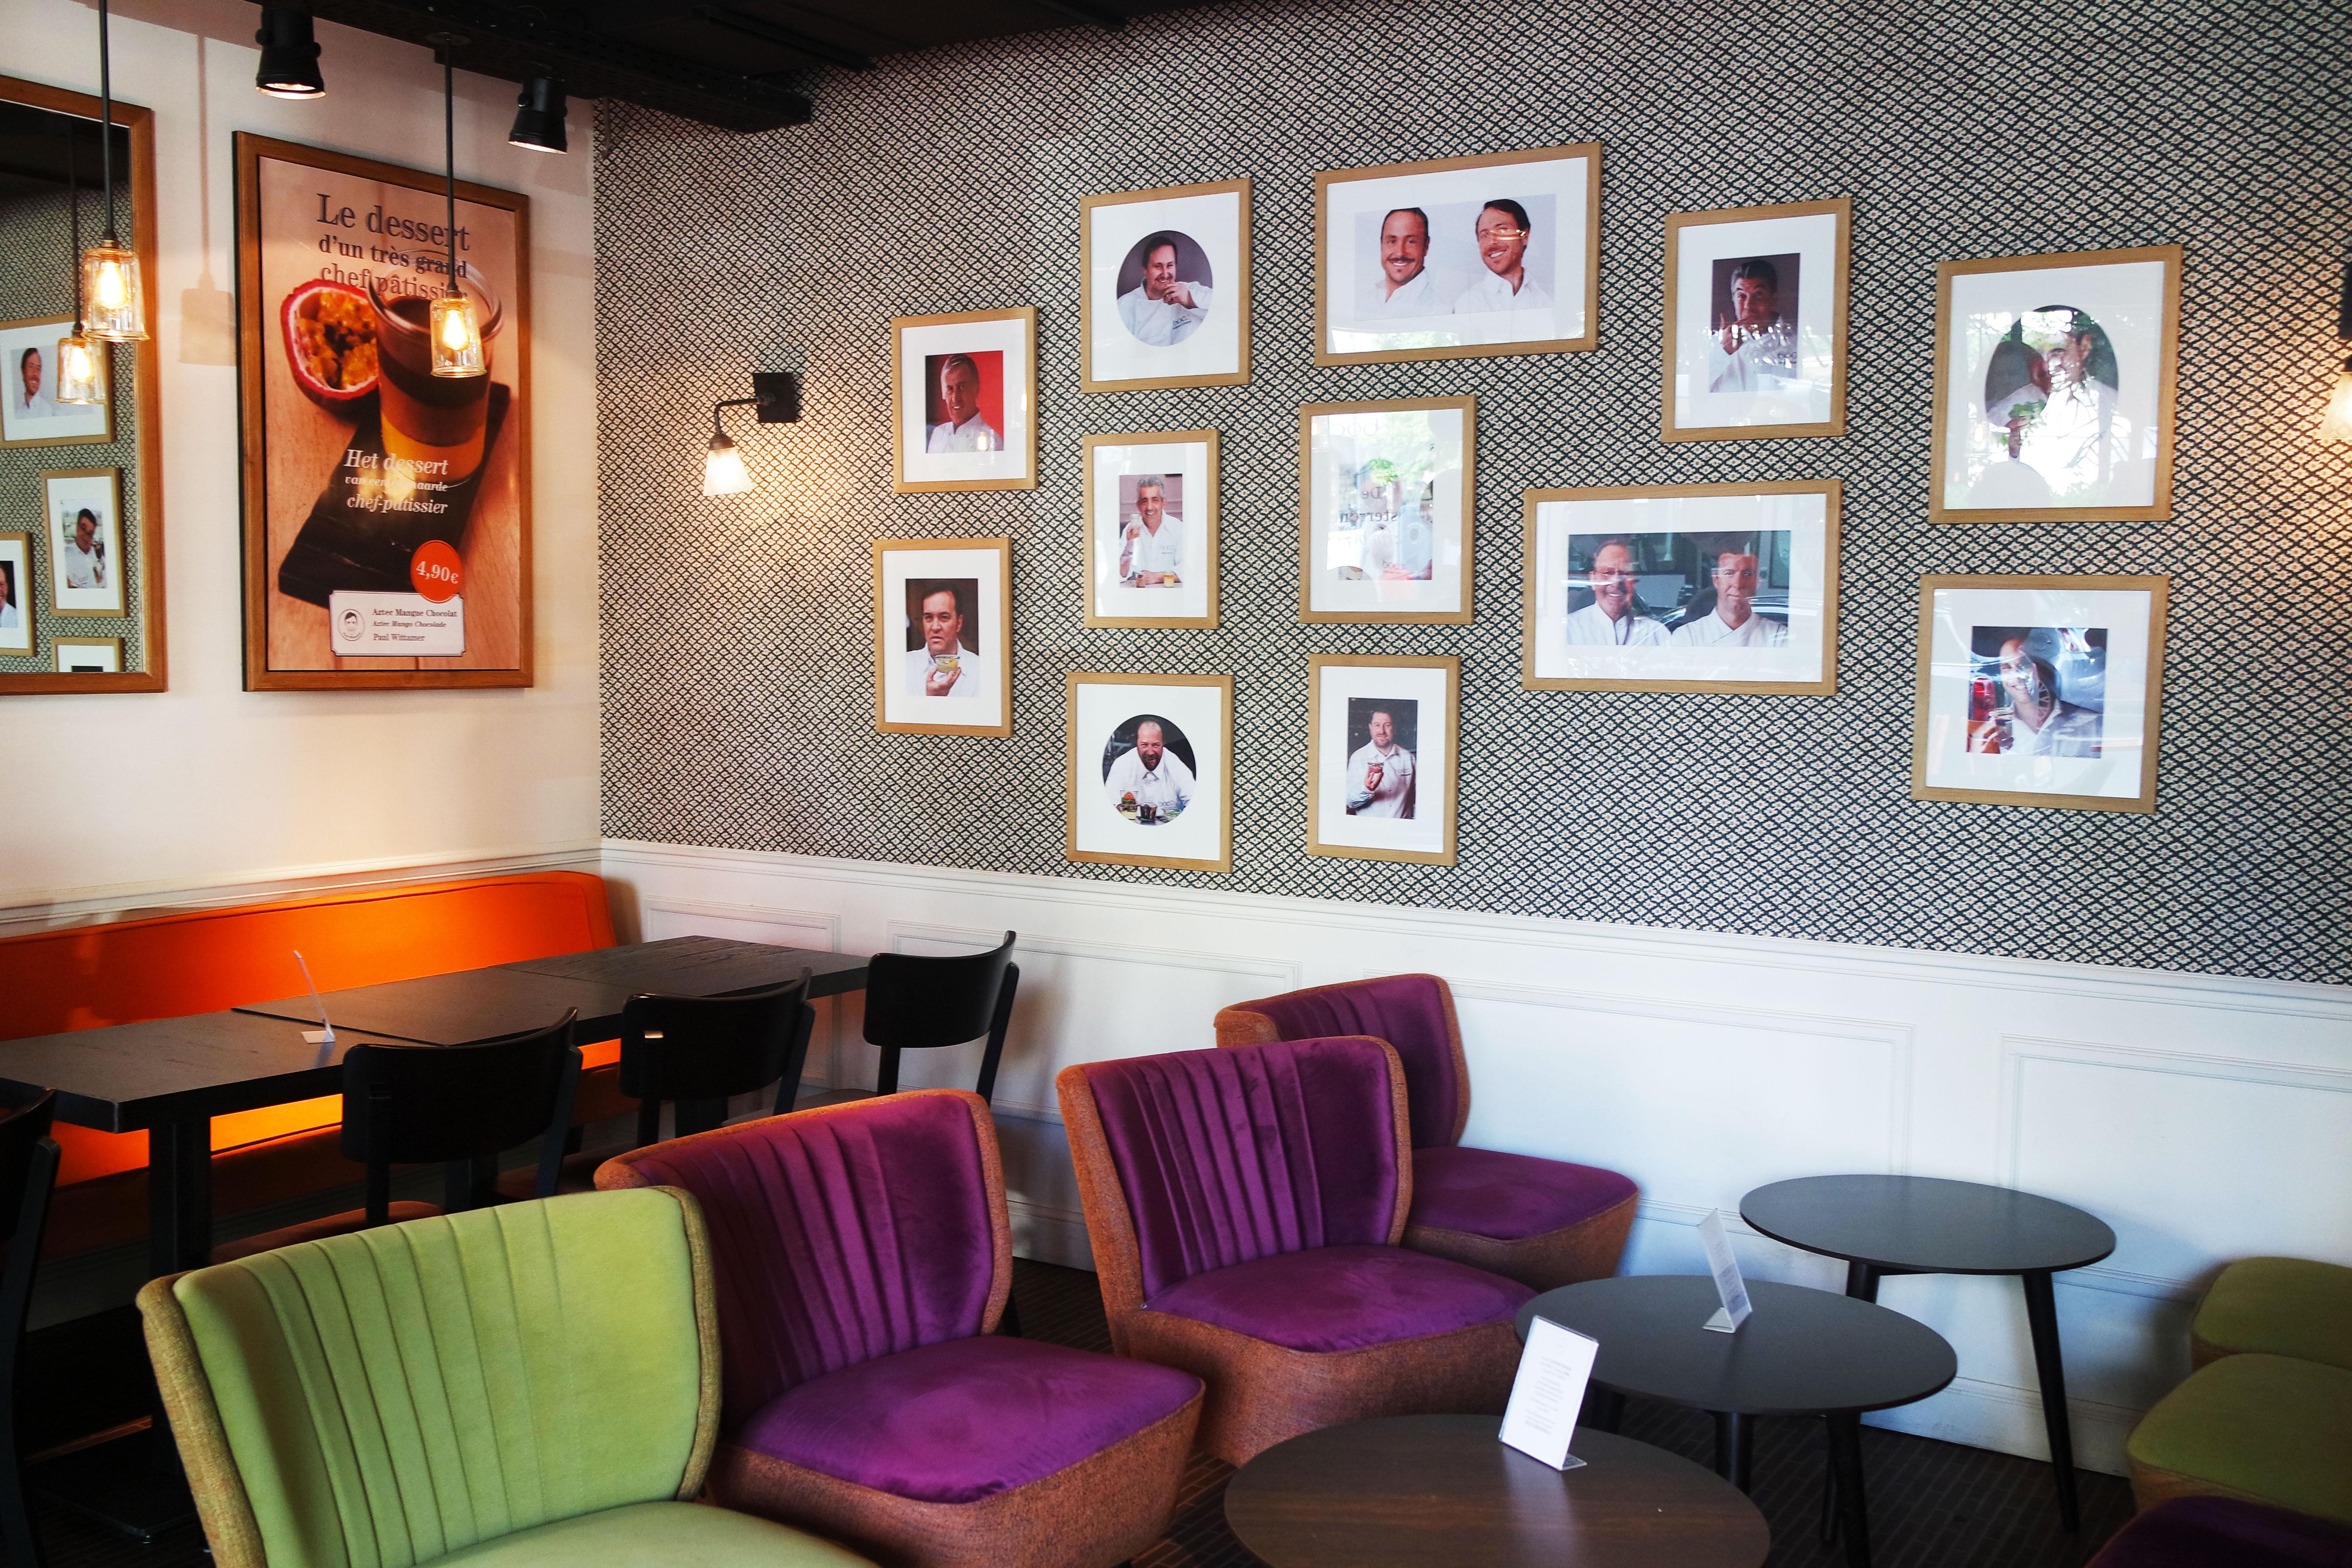 boco-bruxelles-restaurant-lunch-blog-test-avis-conseil-deco-chef